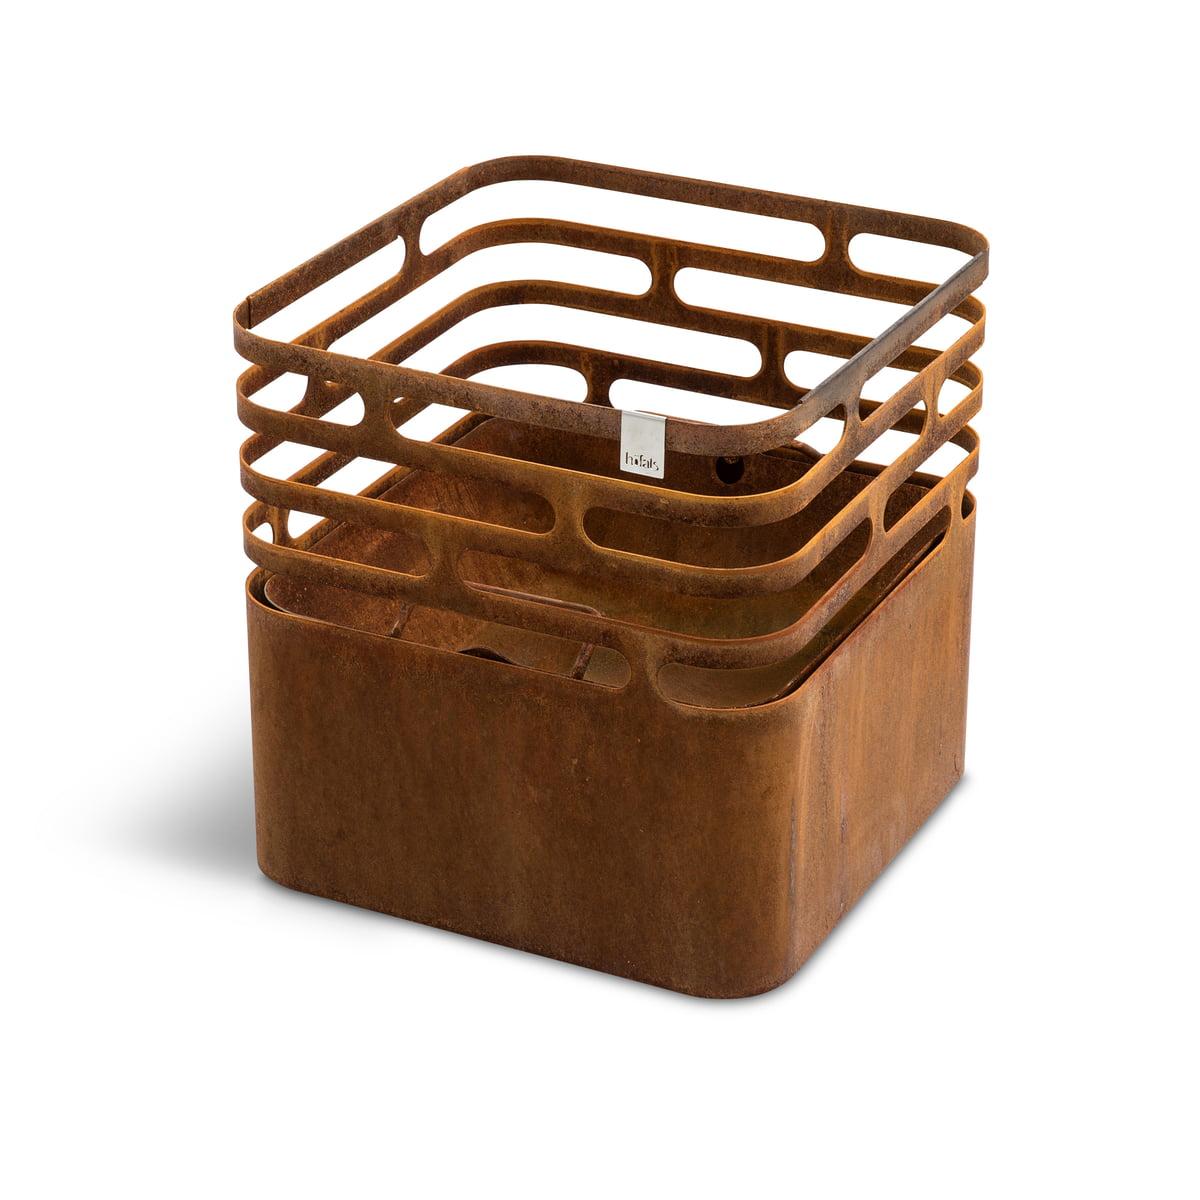 höfats - Cube Feuerkorb, Rostoptik | Garten > Grill und Zubehör > Feürstellen | Rostbraun | Stahl | Höfats